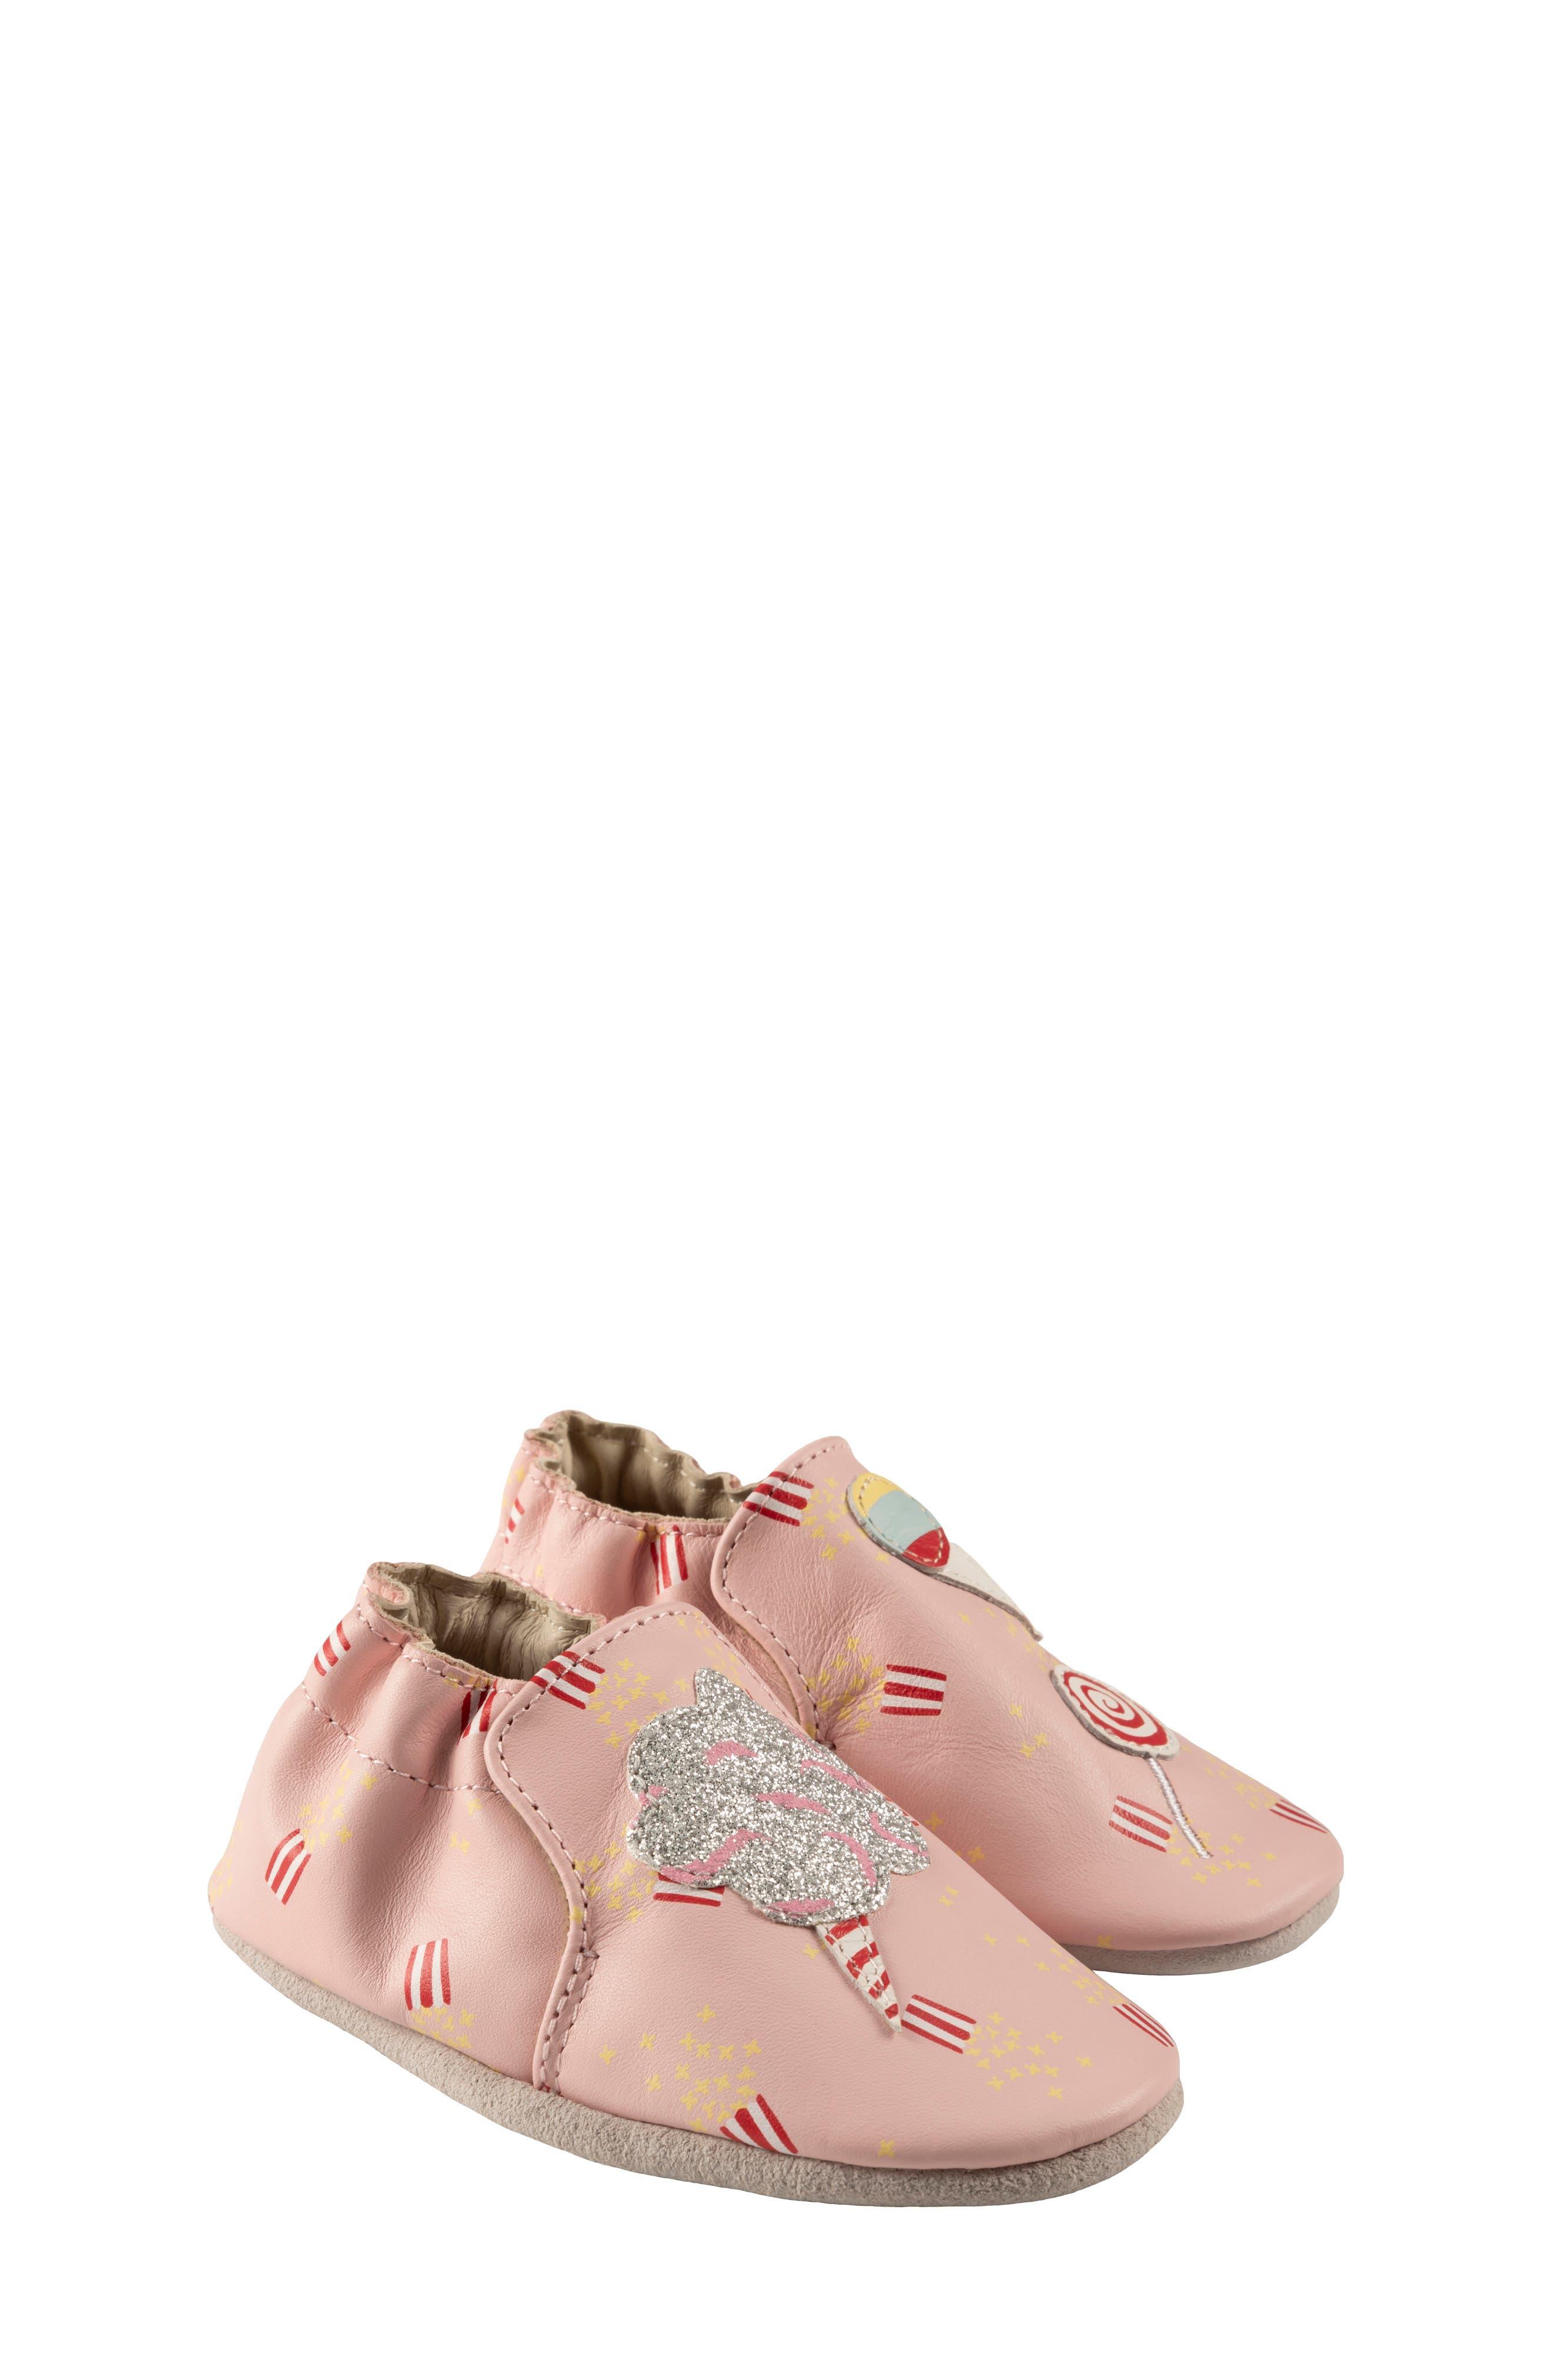 Image of Robeez Dolce Leather Slip-On Shoe